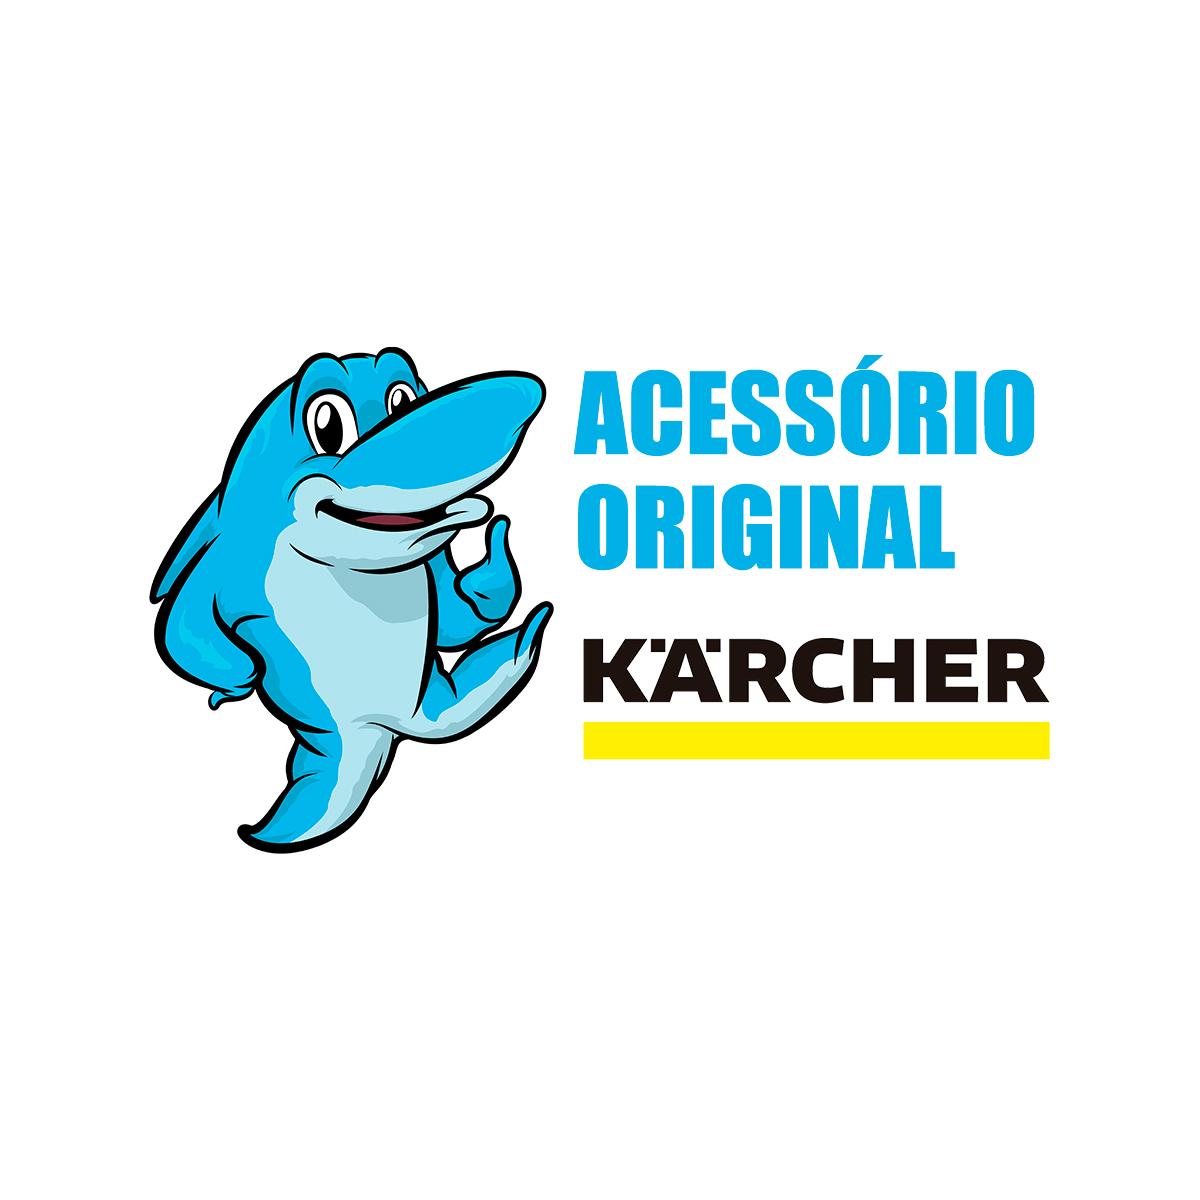 Bico turbo para Lavadora Karcher HD585 (127V), HD4/13, HD5/11 (220v), HD5/12 (220v), HD600 (127v), HD658 (220v), HDS558 C, HDS5/13 UX Original 035